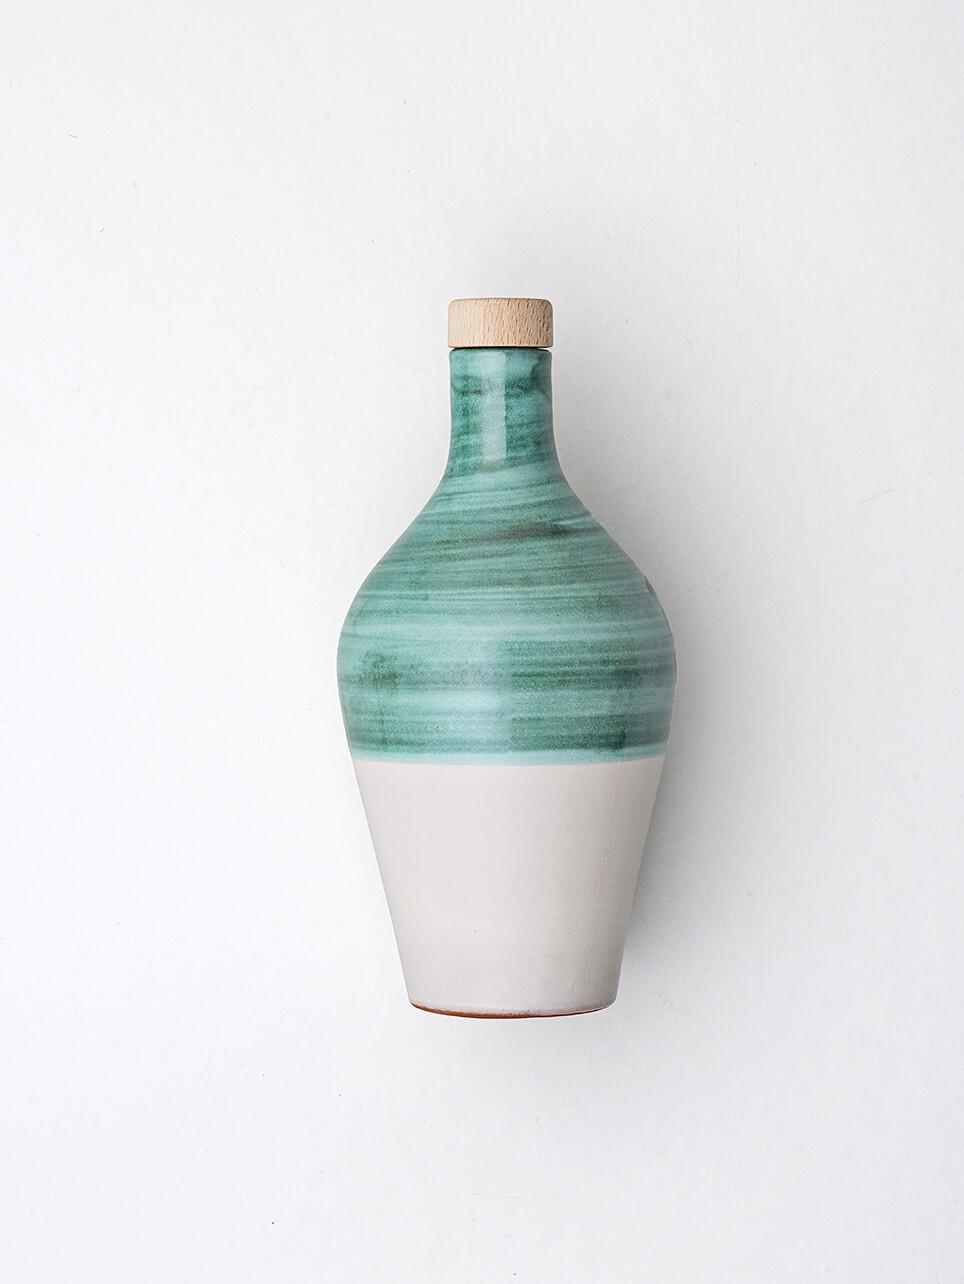 La Fiaschetta Extra Natives Olivenöl,  470ml Keramikkrug in Grün